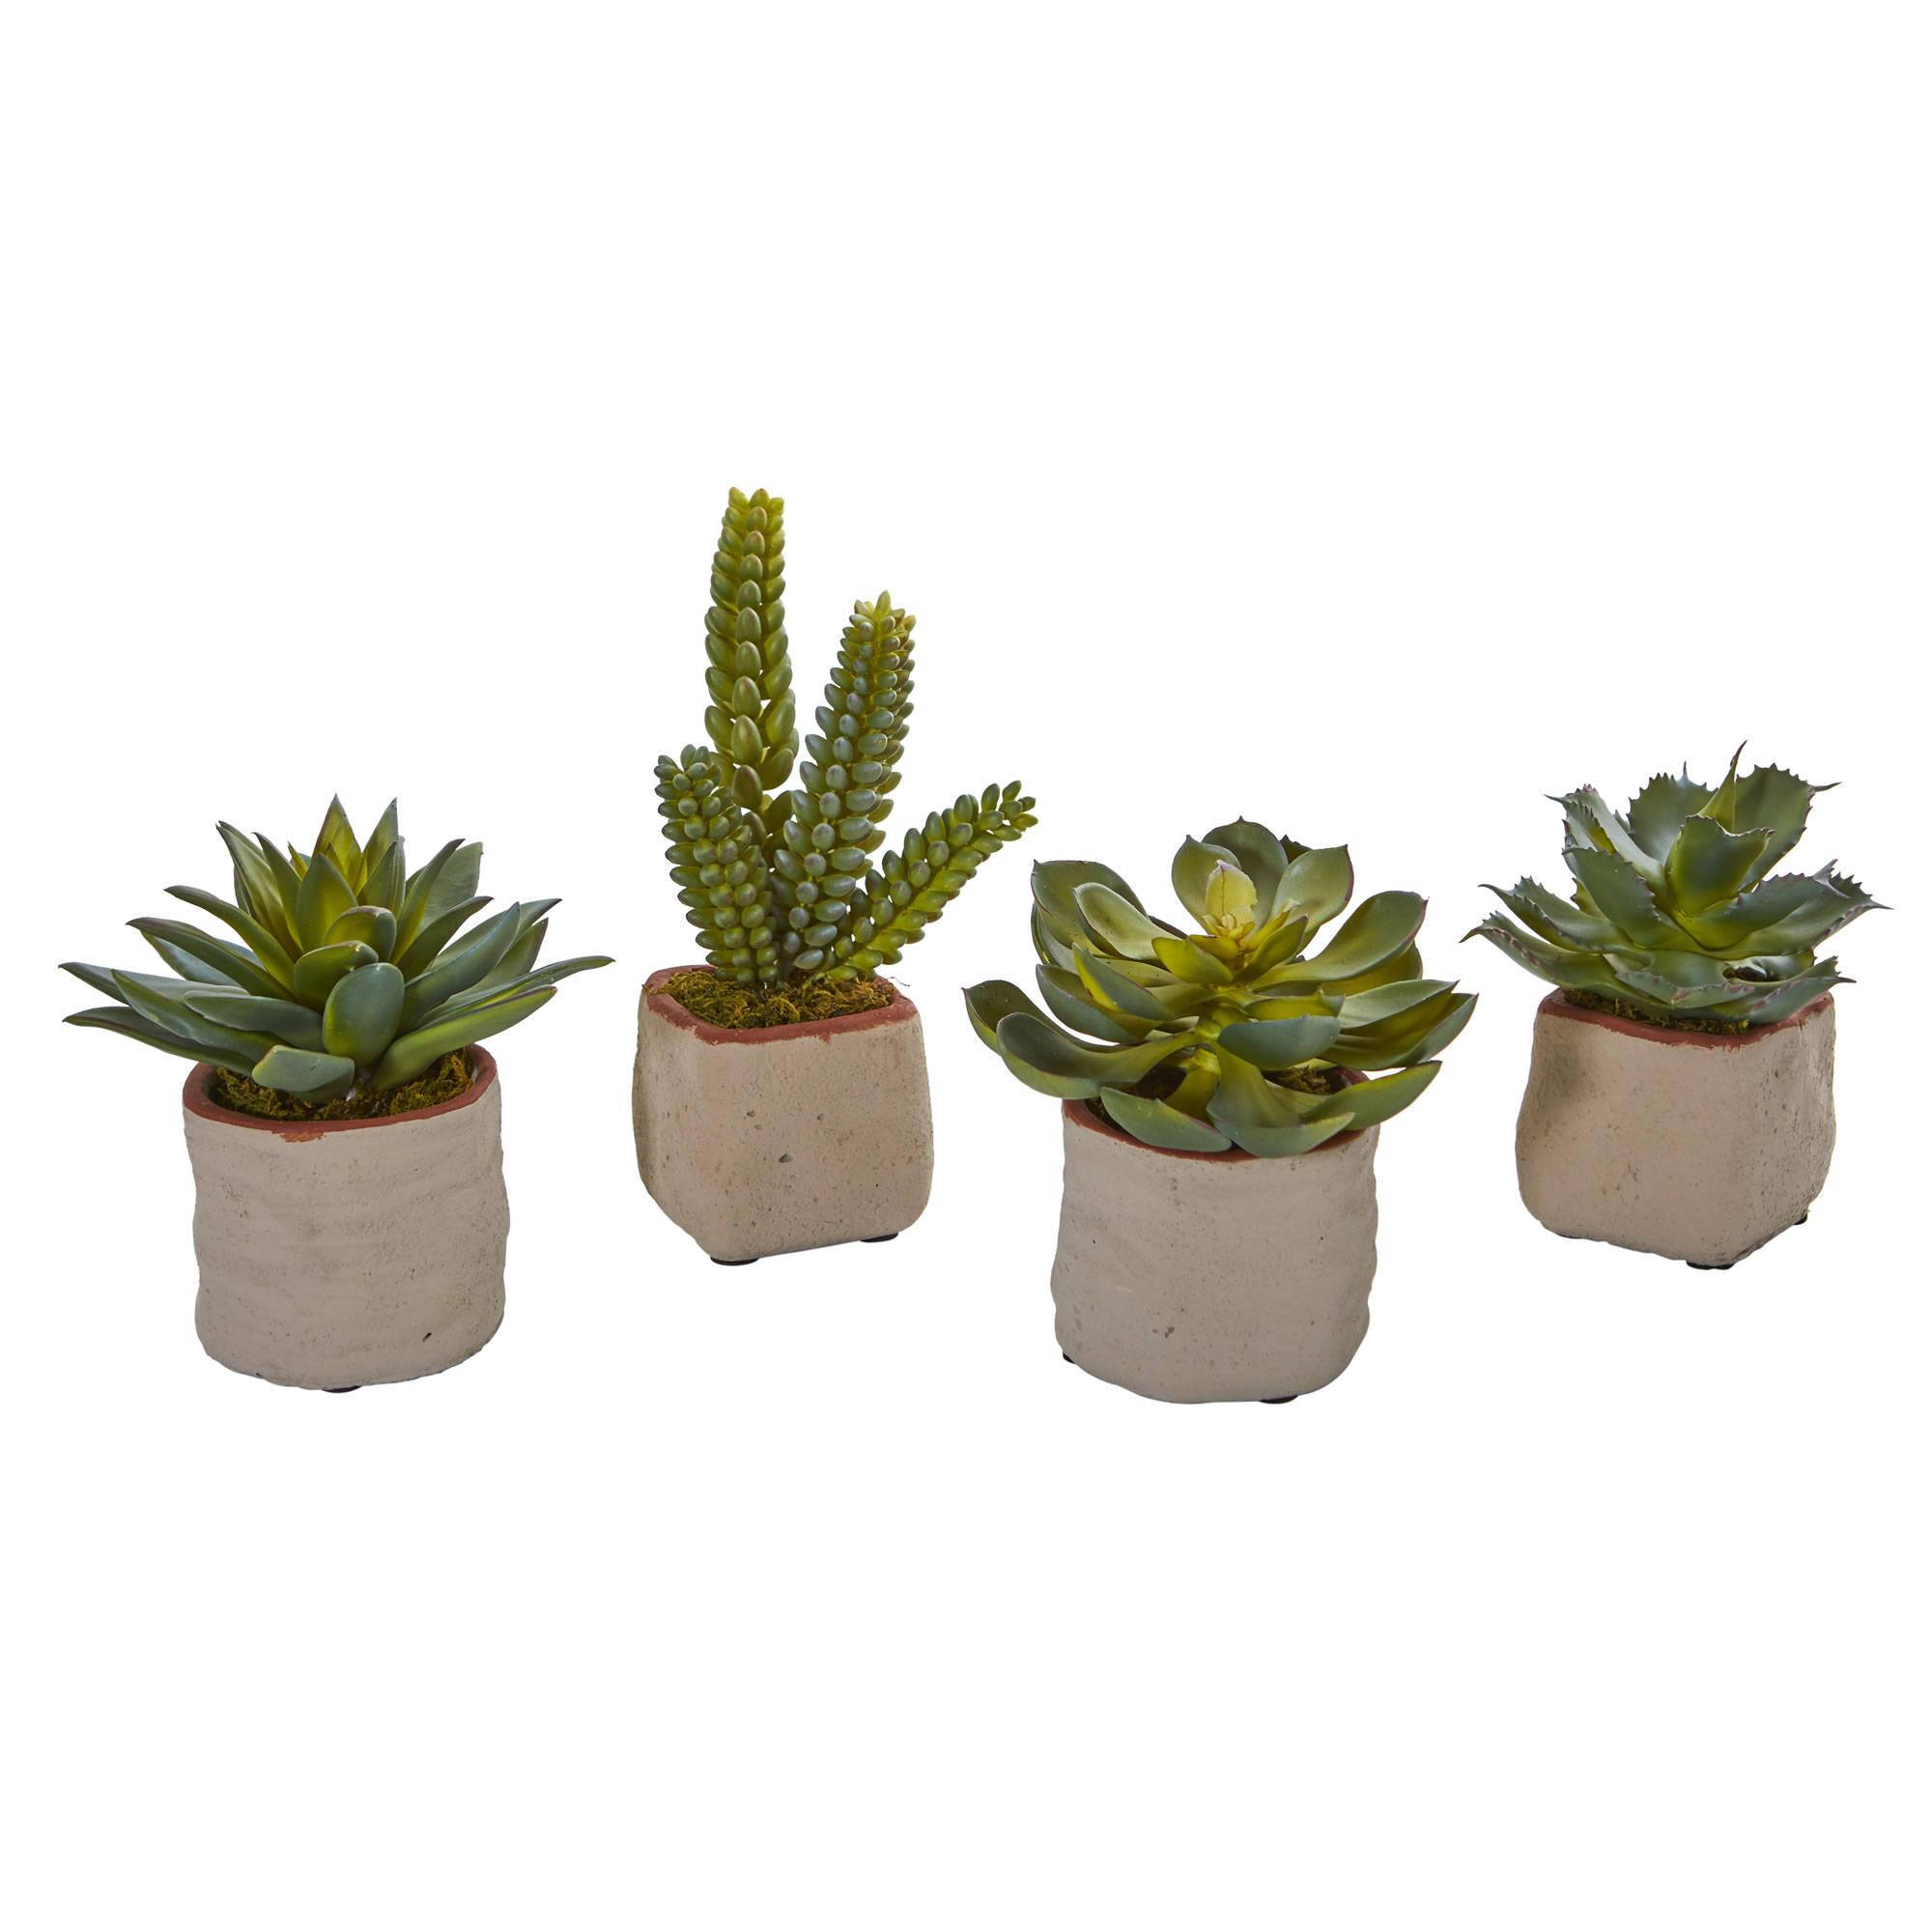 4 Artificial Potted Succulents, Potted Succulent Plants, Artificial ...